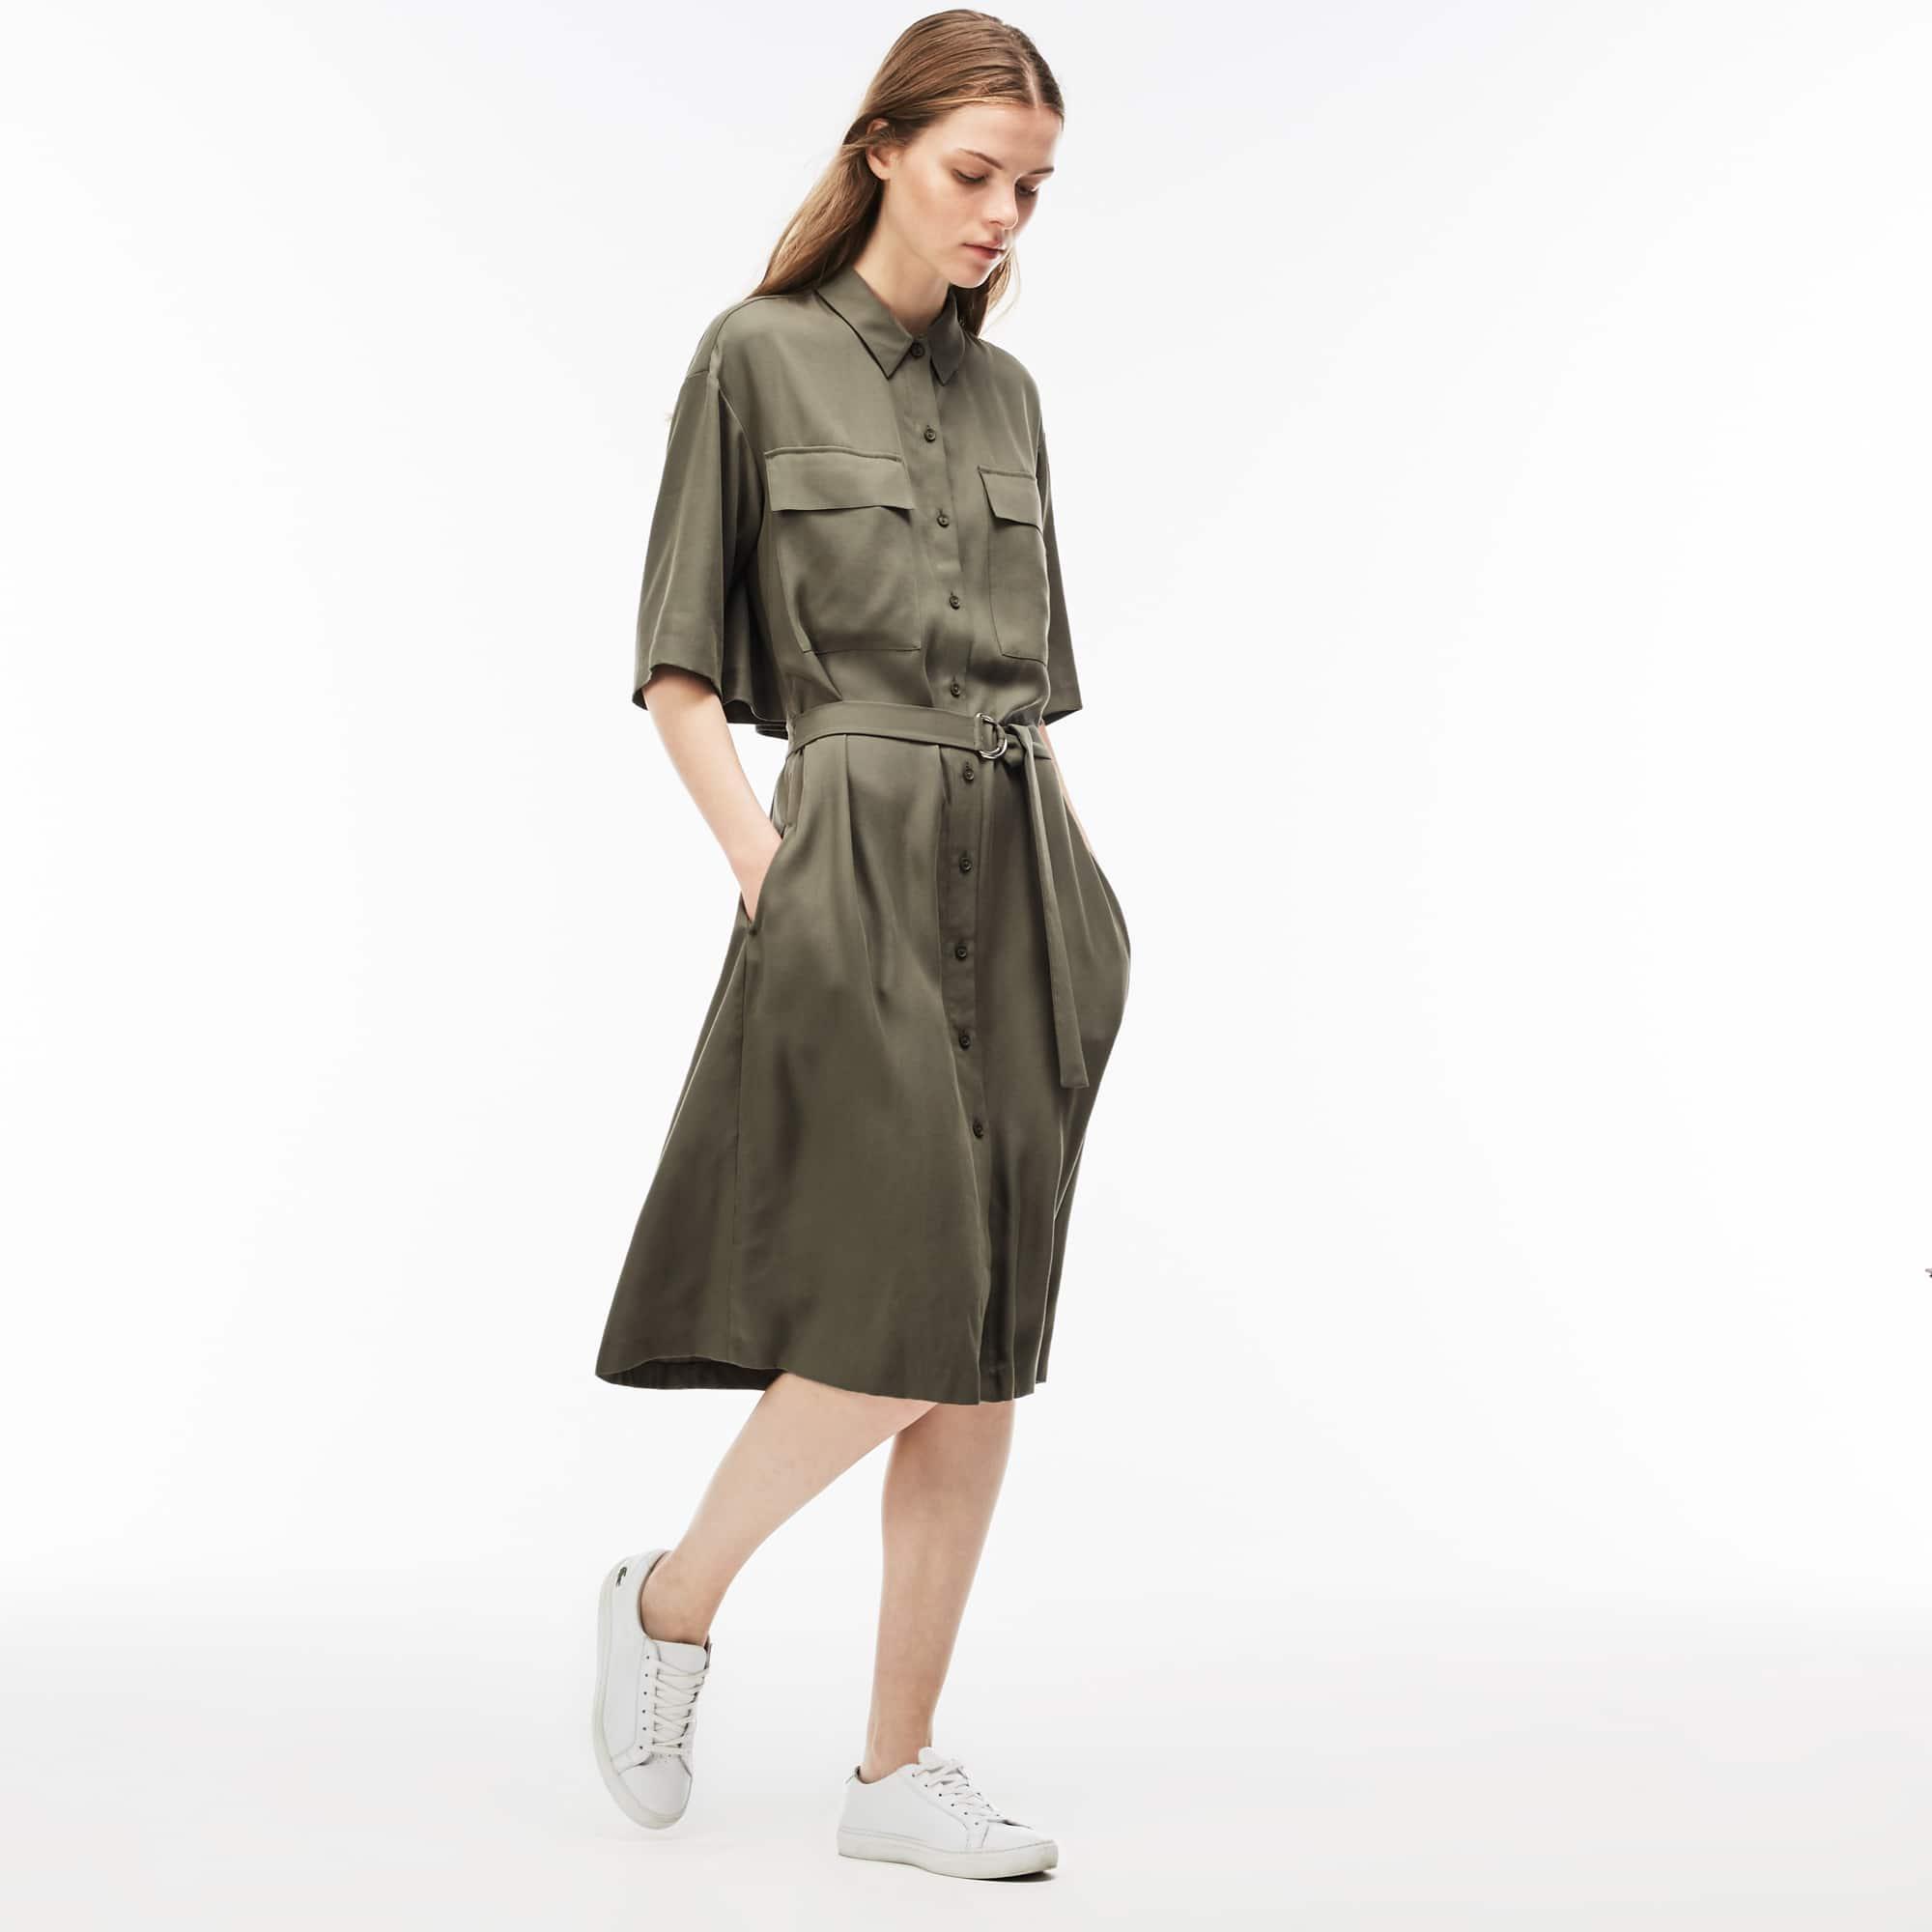 Damen-Hemdkleid aus Piqué mit Gürtel